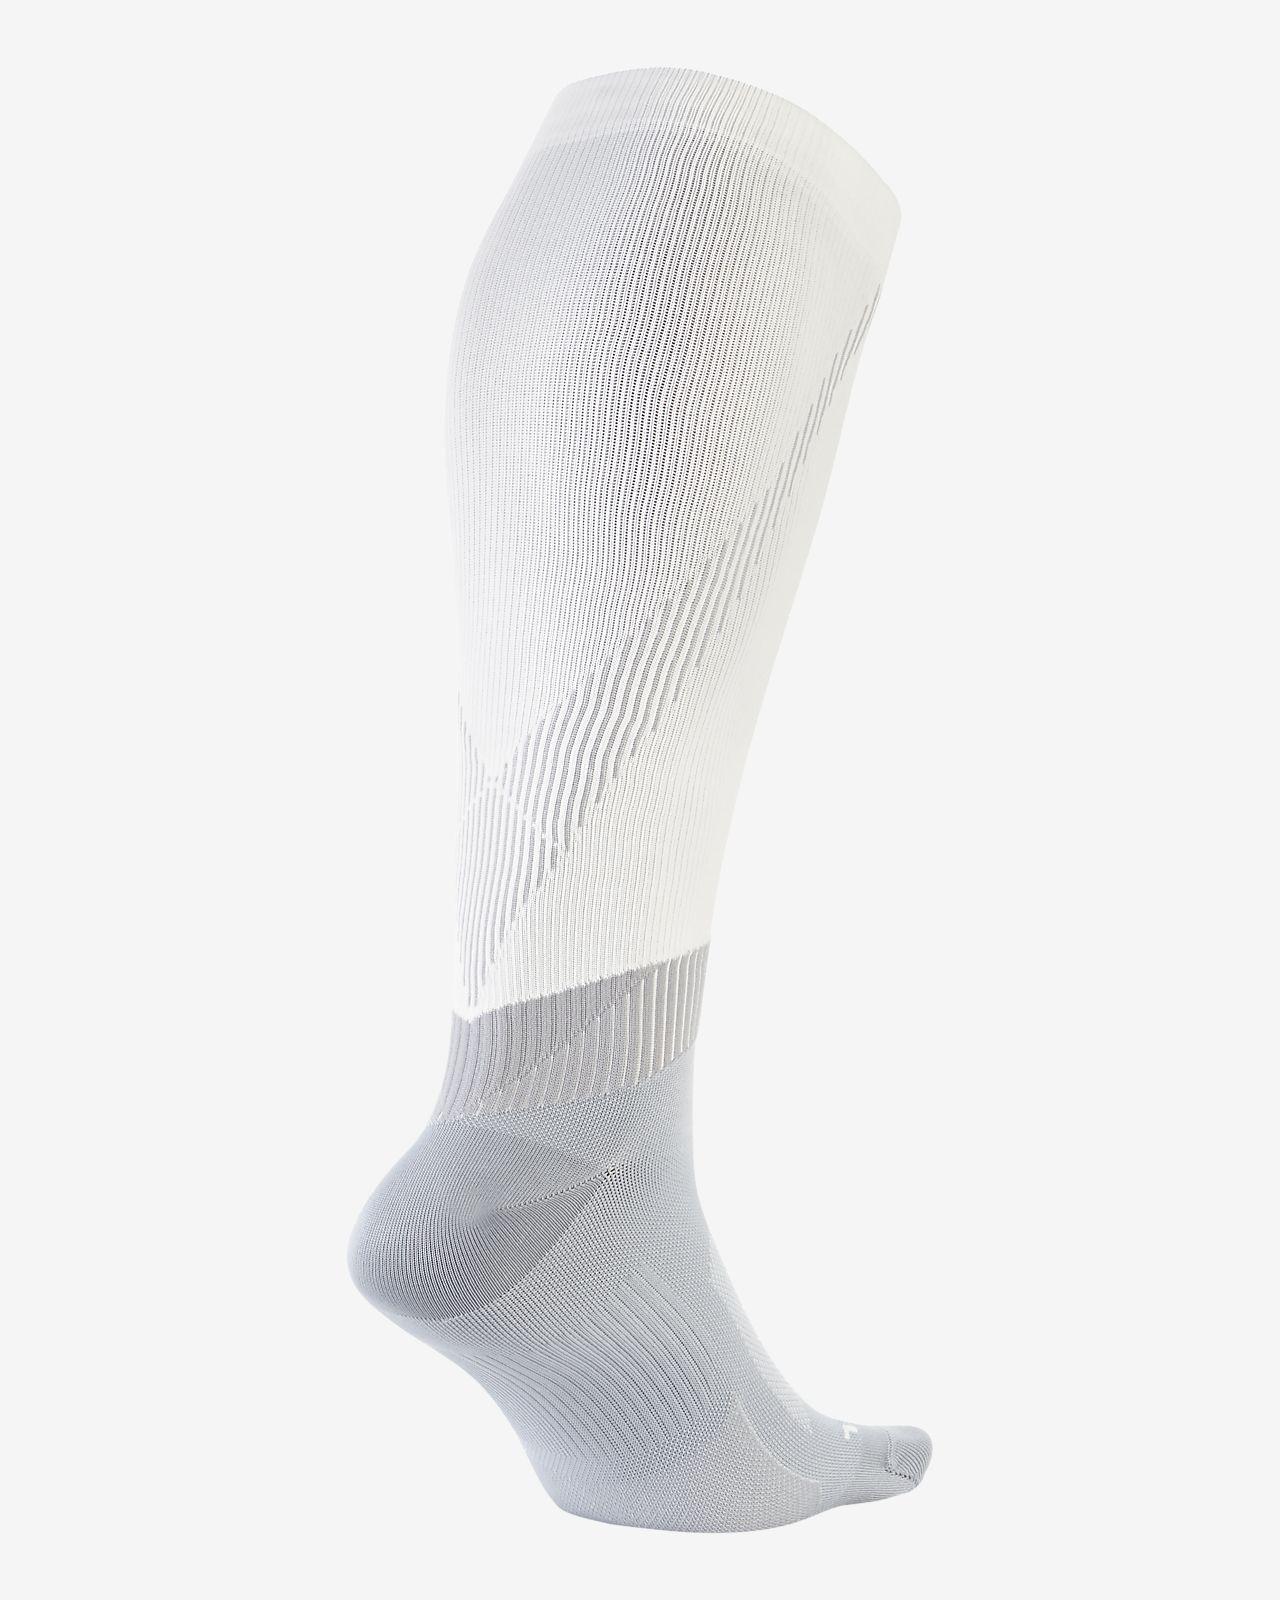 Skarpety do biegania Nike Elite Over-The-Calf